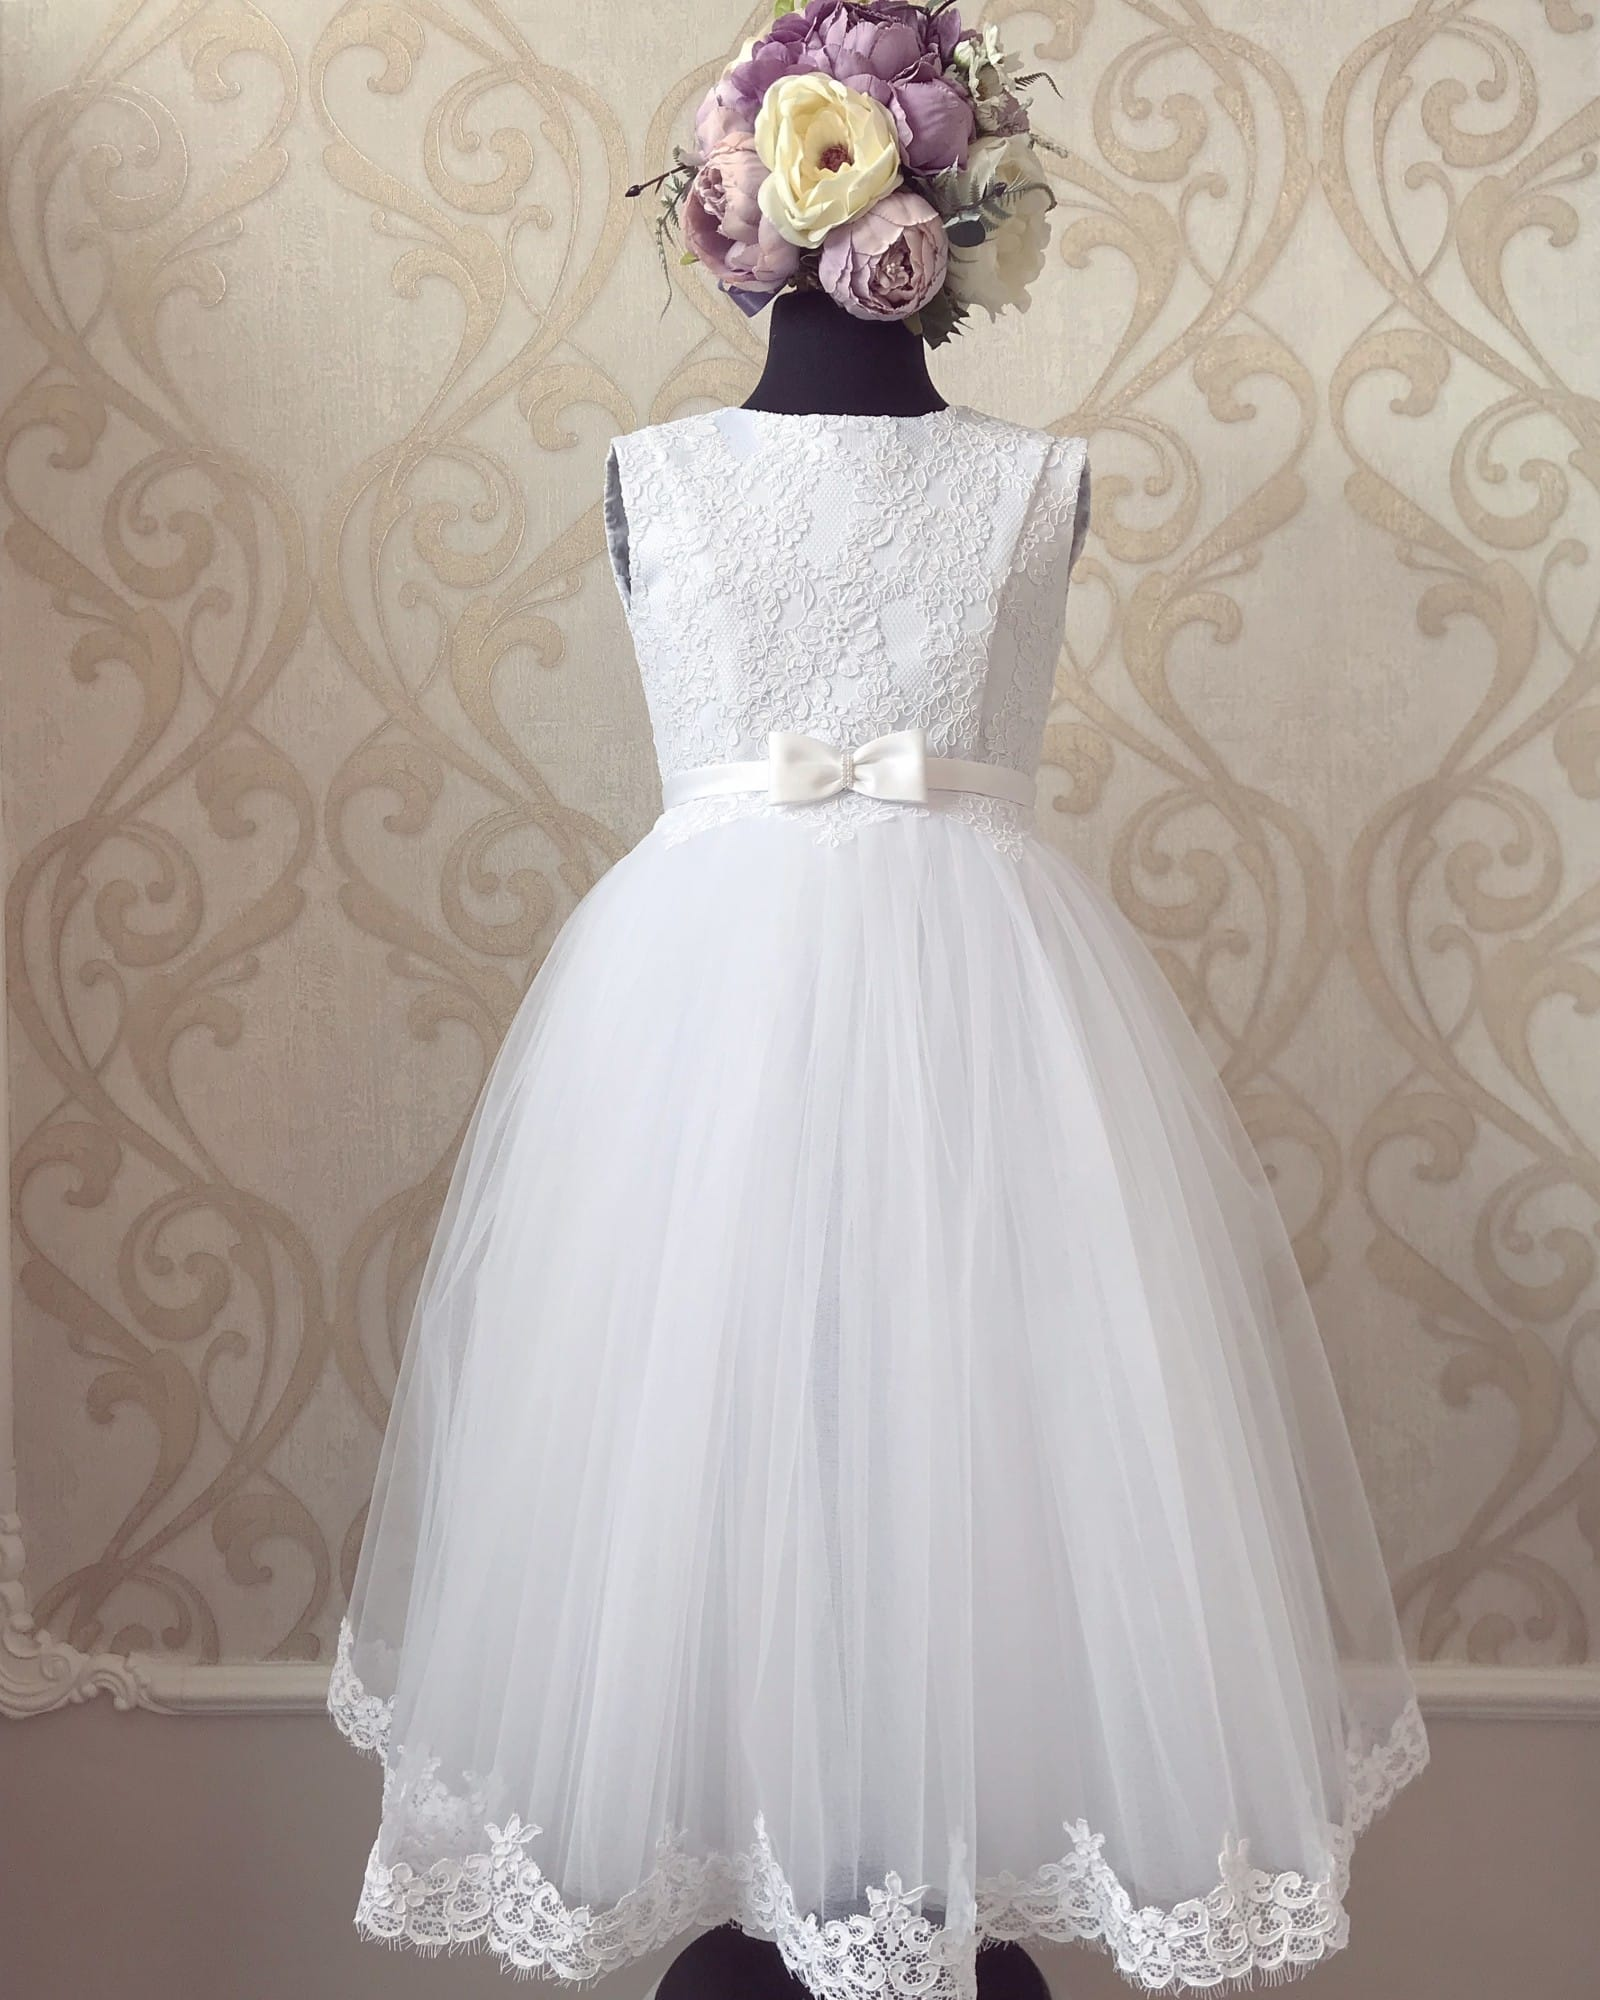 Flower Girl Dress / Communion Dress